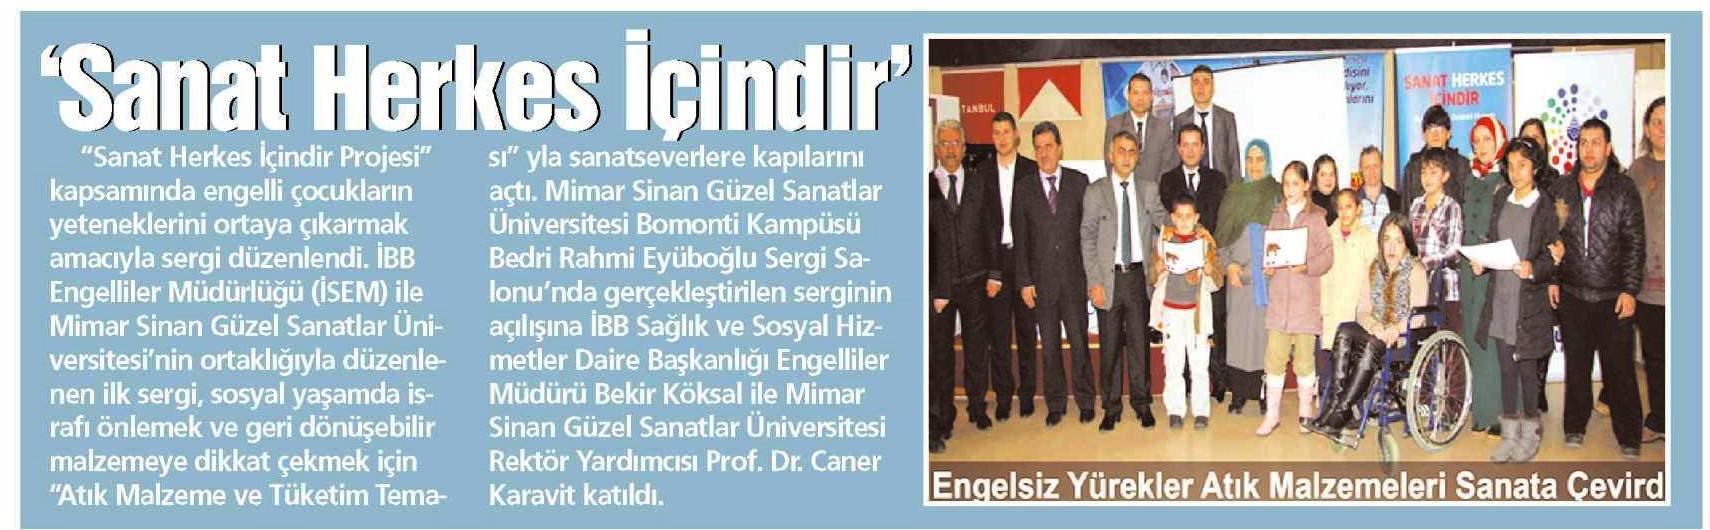 20.02.2013_istanbul_sanat